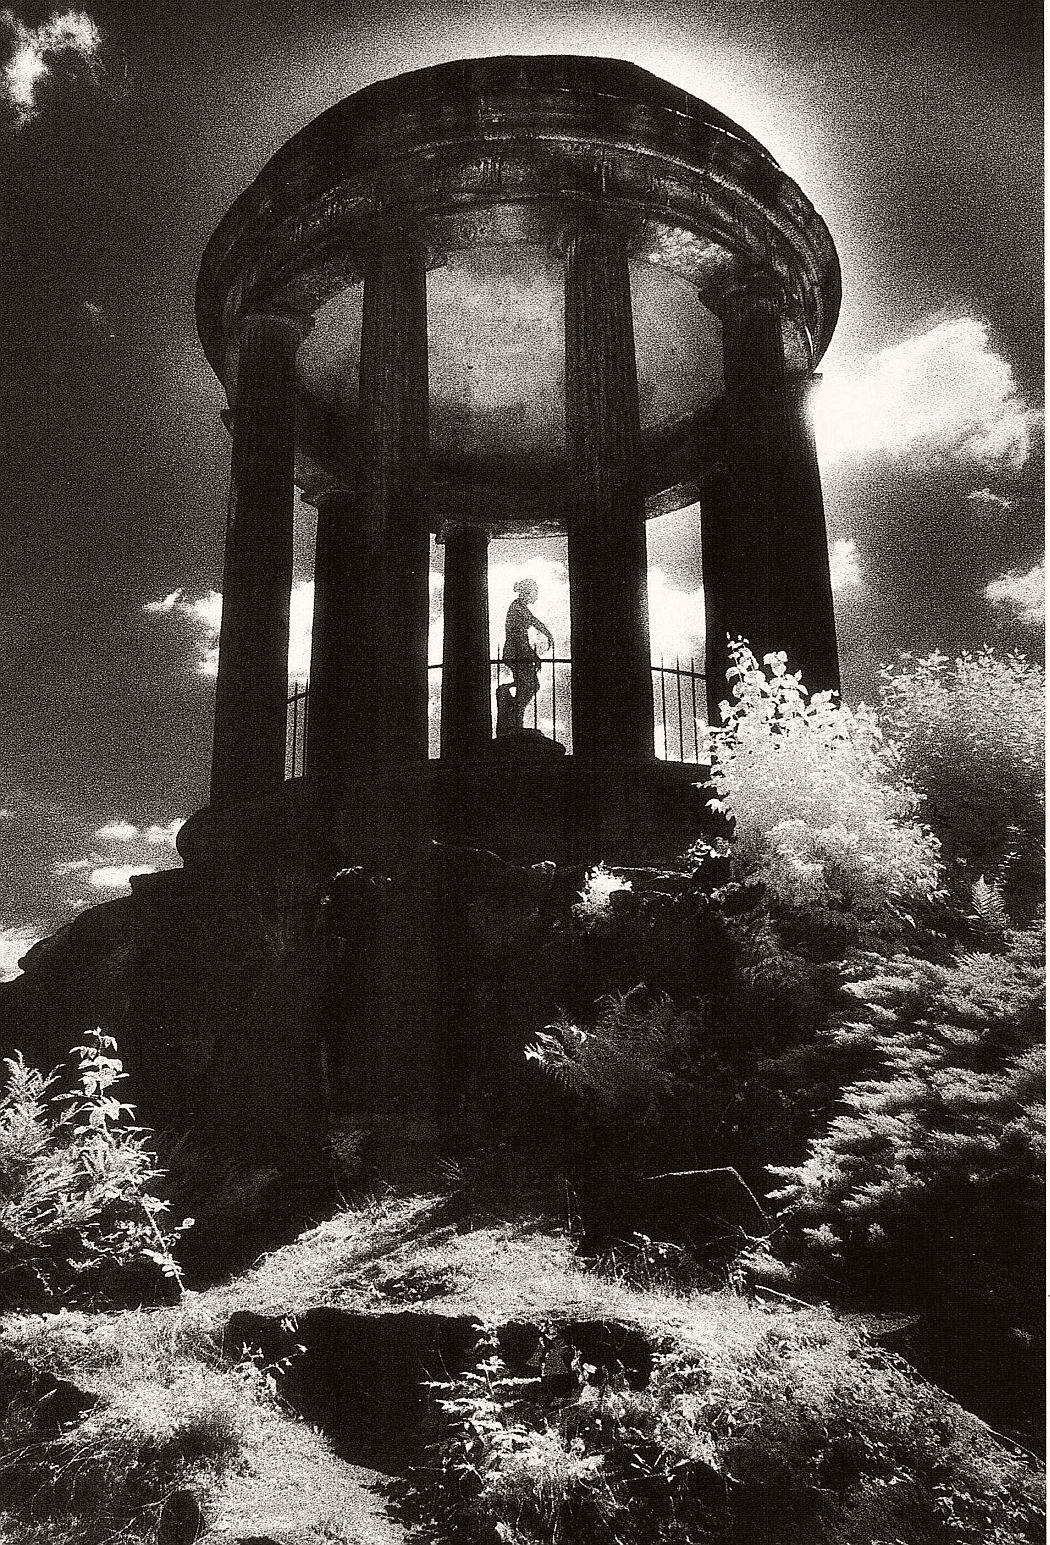 surreal-architecture-photographer-simon-marsden-10